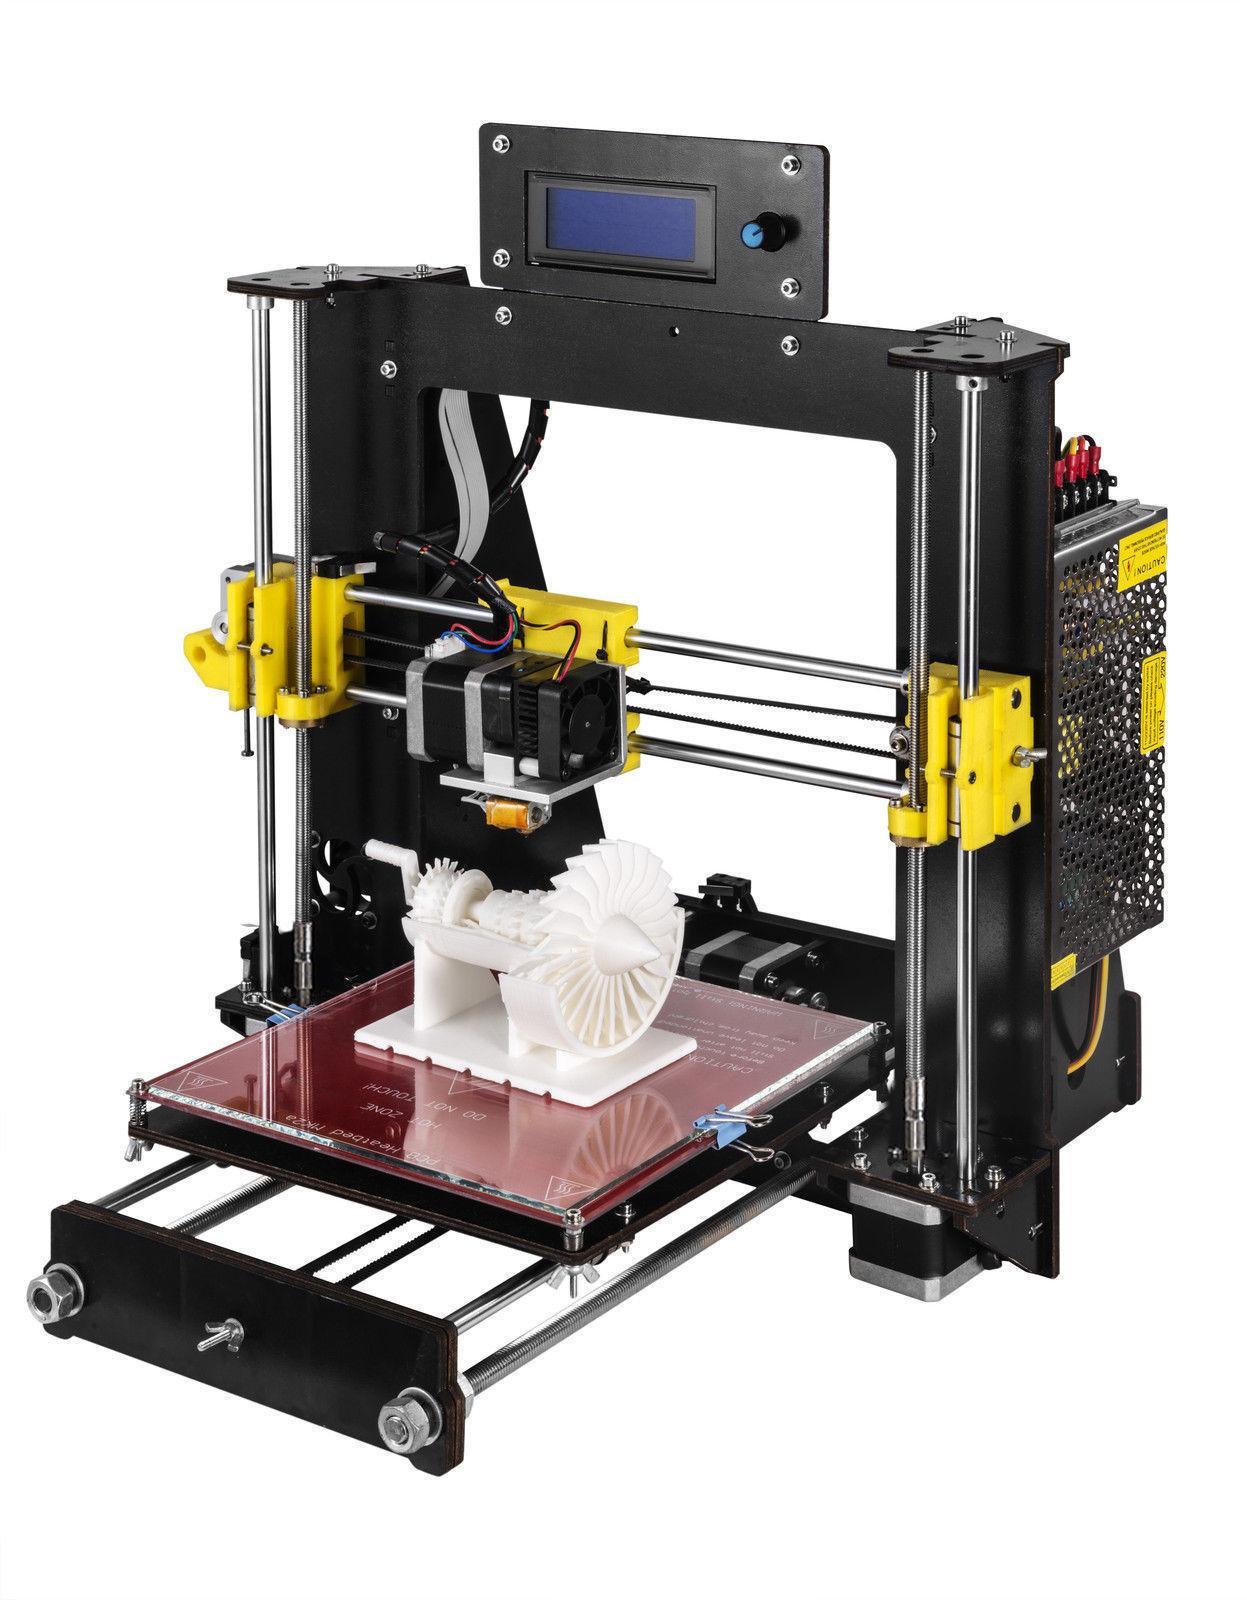 Imprimante 3D CTC Prusa I3 - 20x20x18 cm